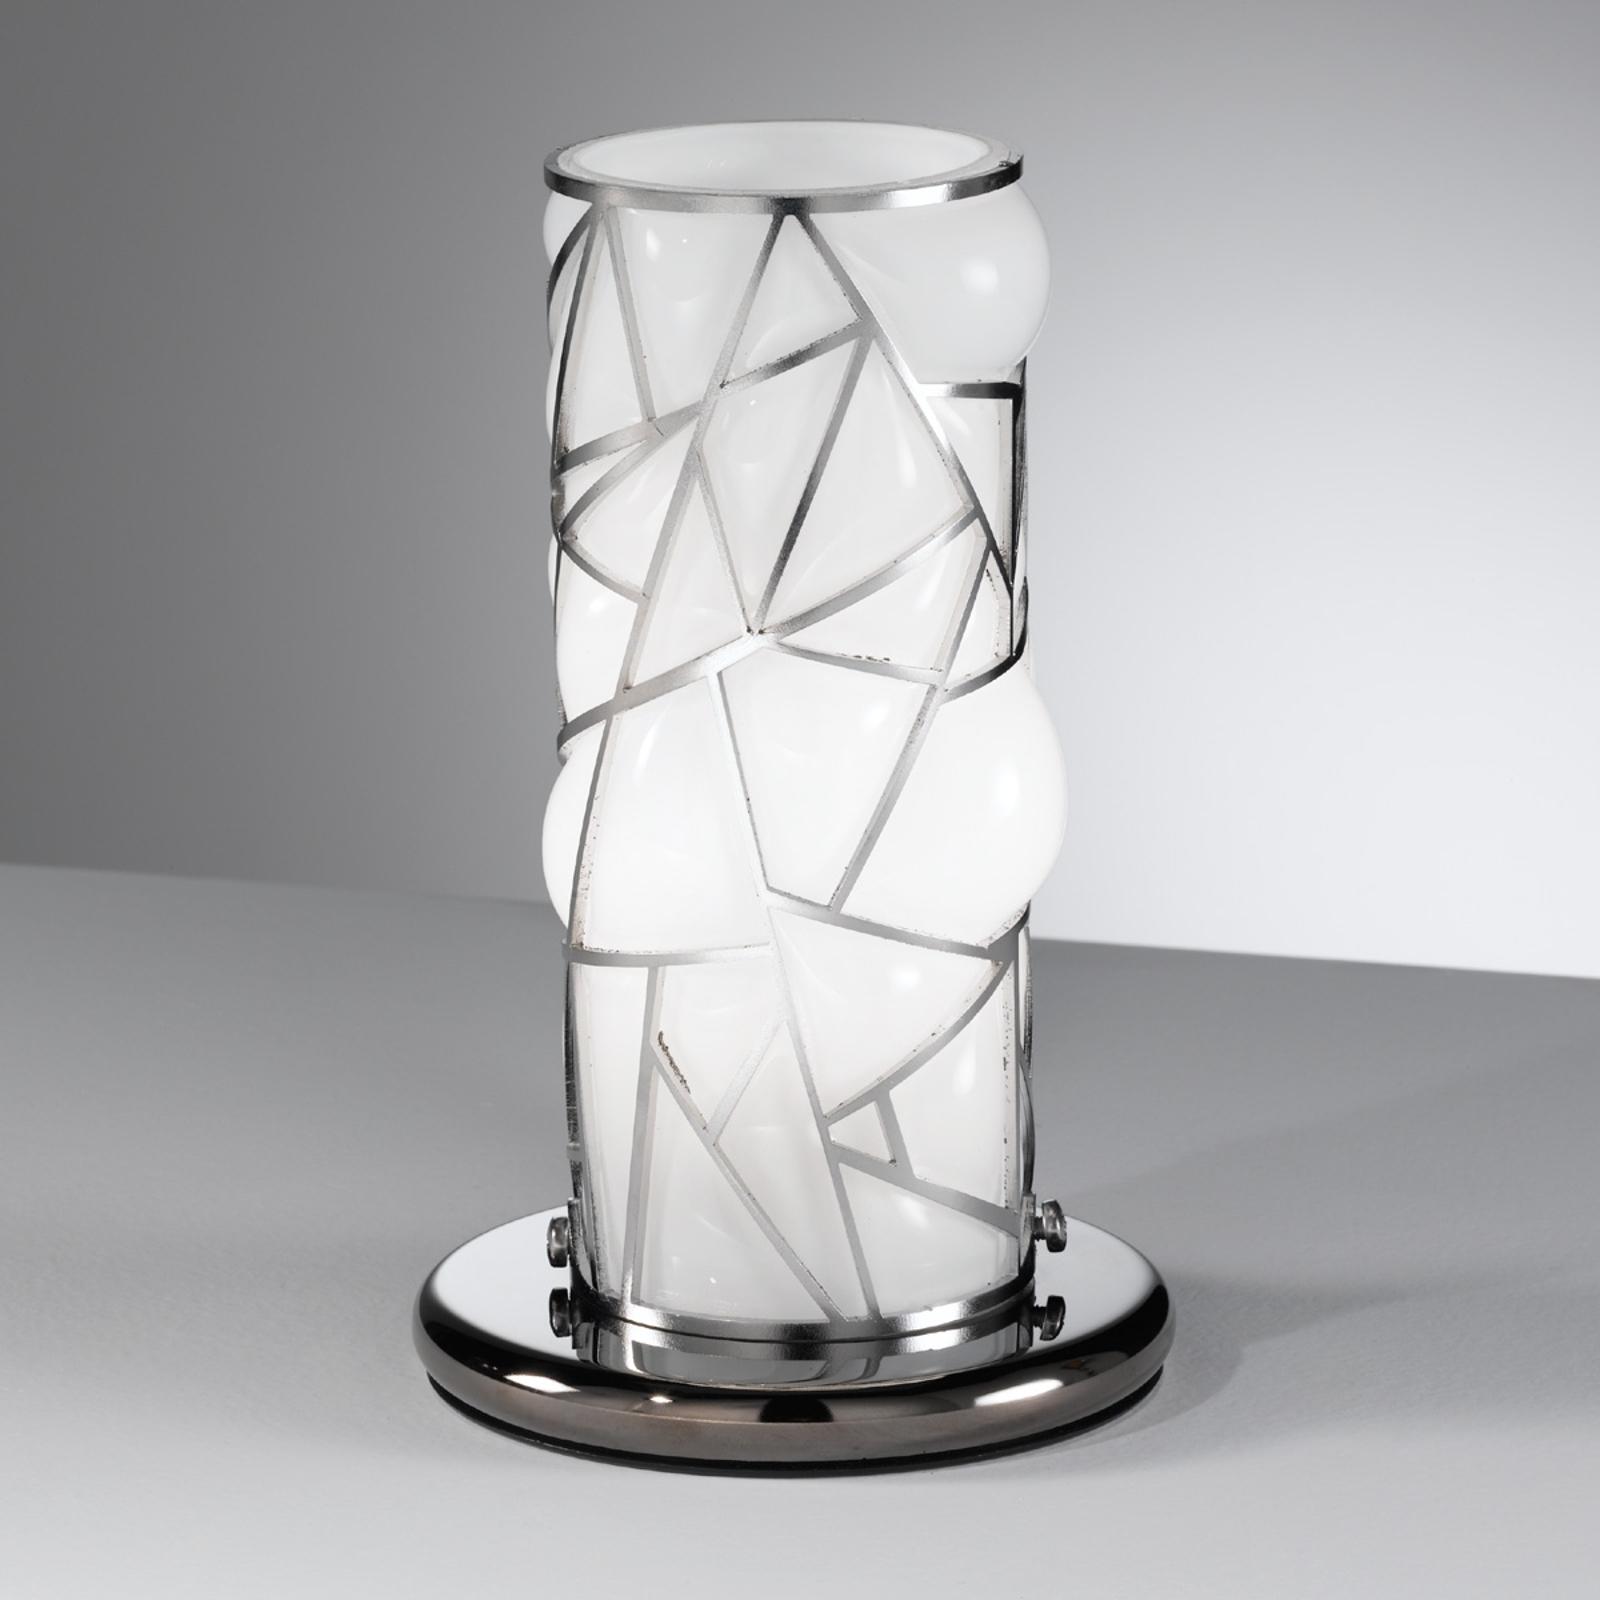 Tafellamp Orione met rvs-elementen, wit